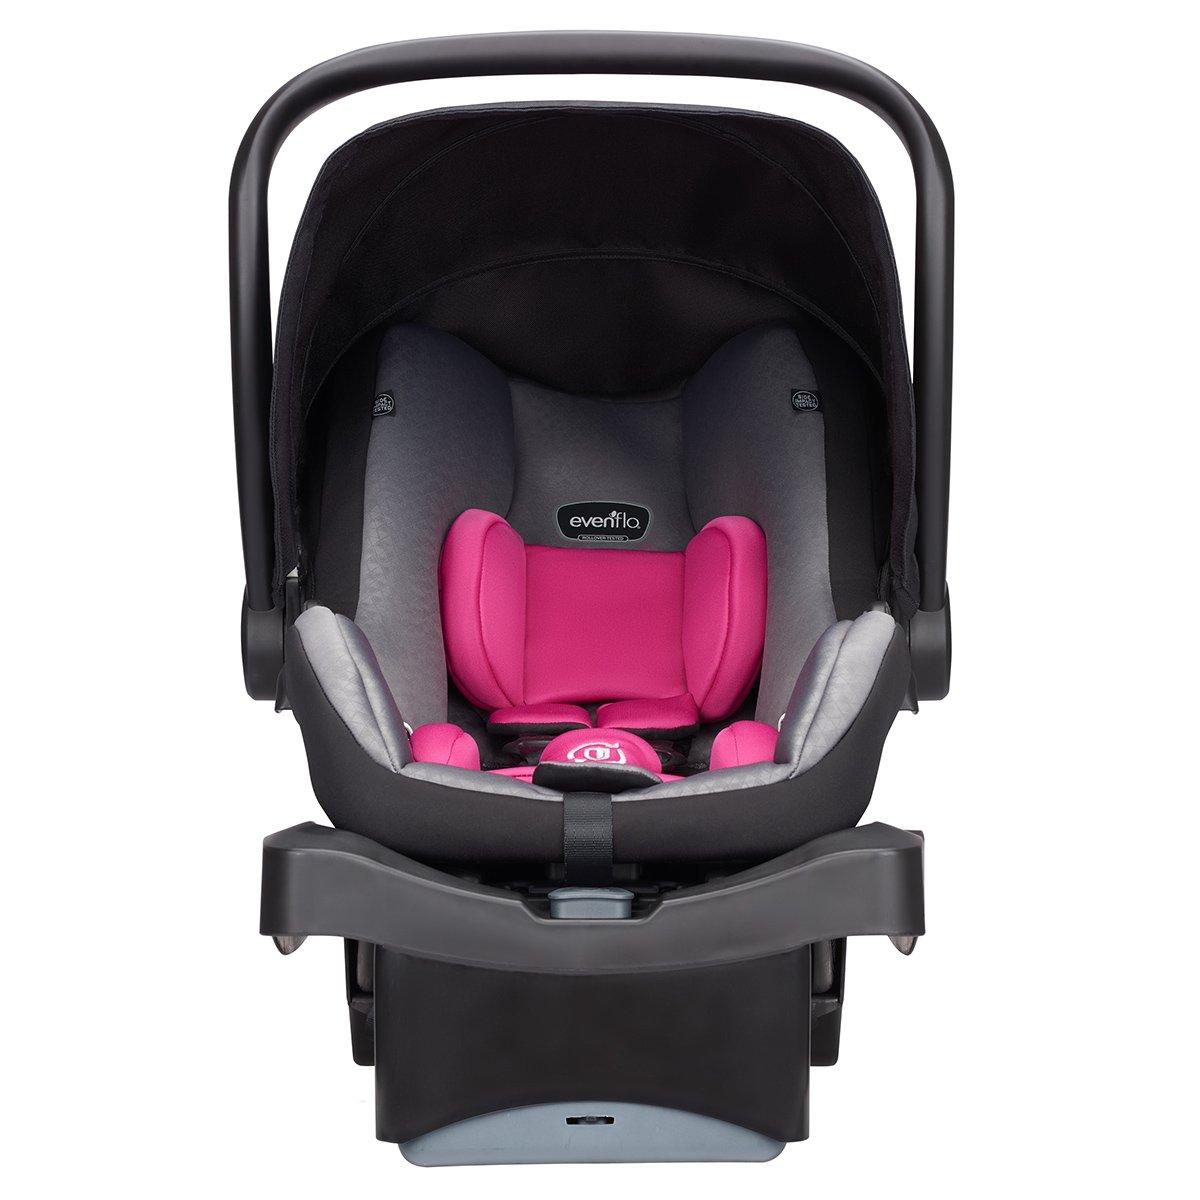 Amazon.com: Evenflo litemax 35 Platinum bebé asiento de ...